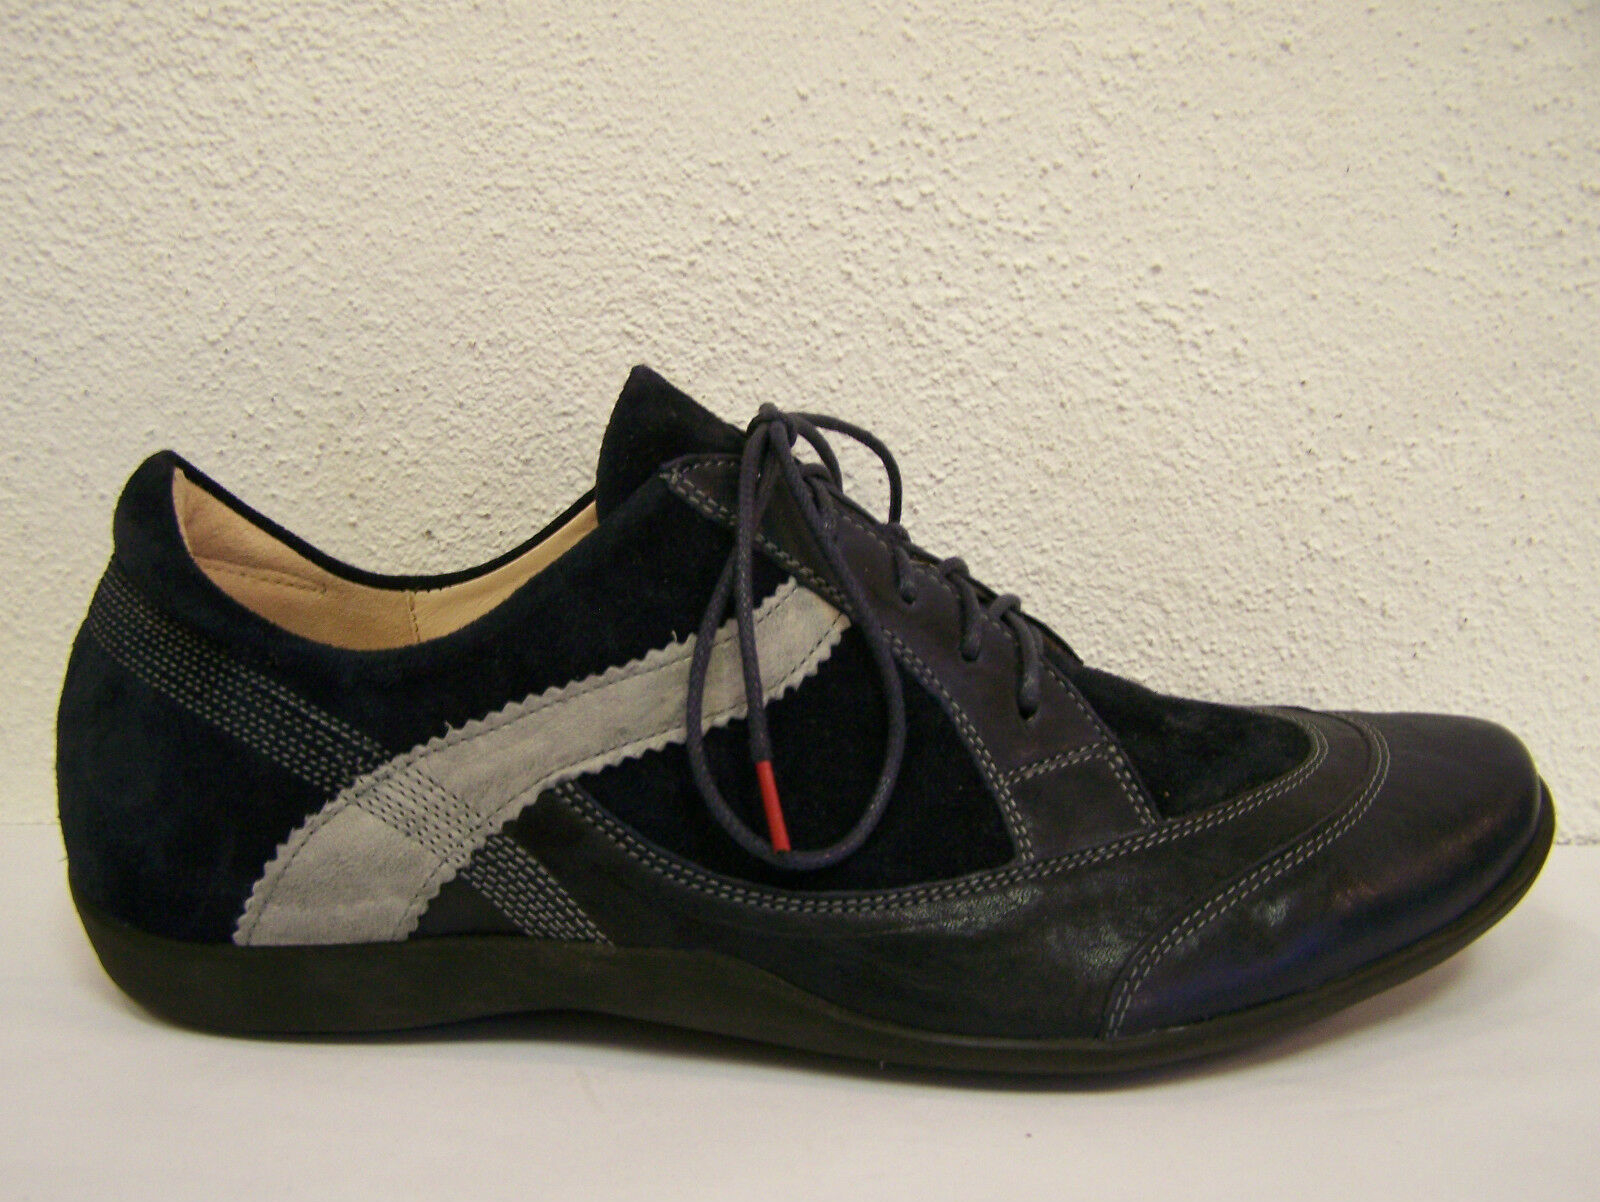 Think Schuhe Modell Stone in ocean kombi Schnürer incl. Think Tüte